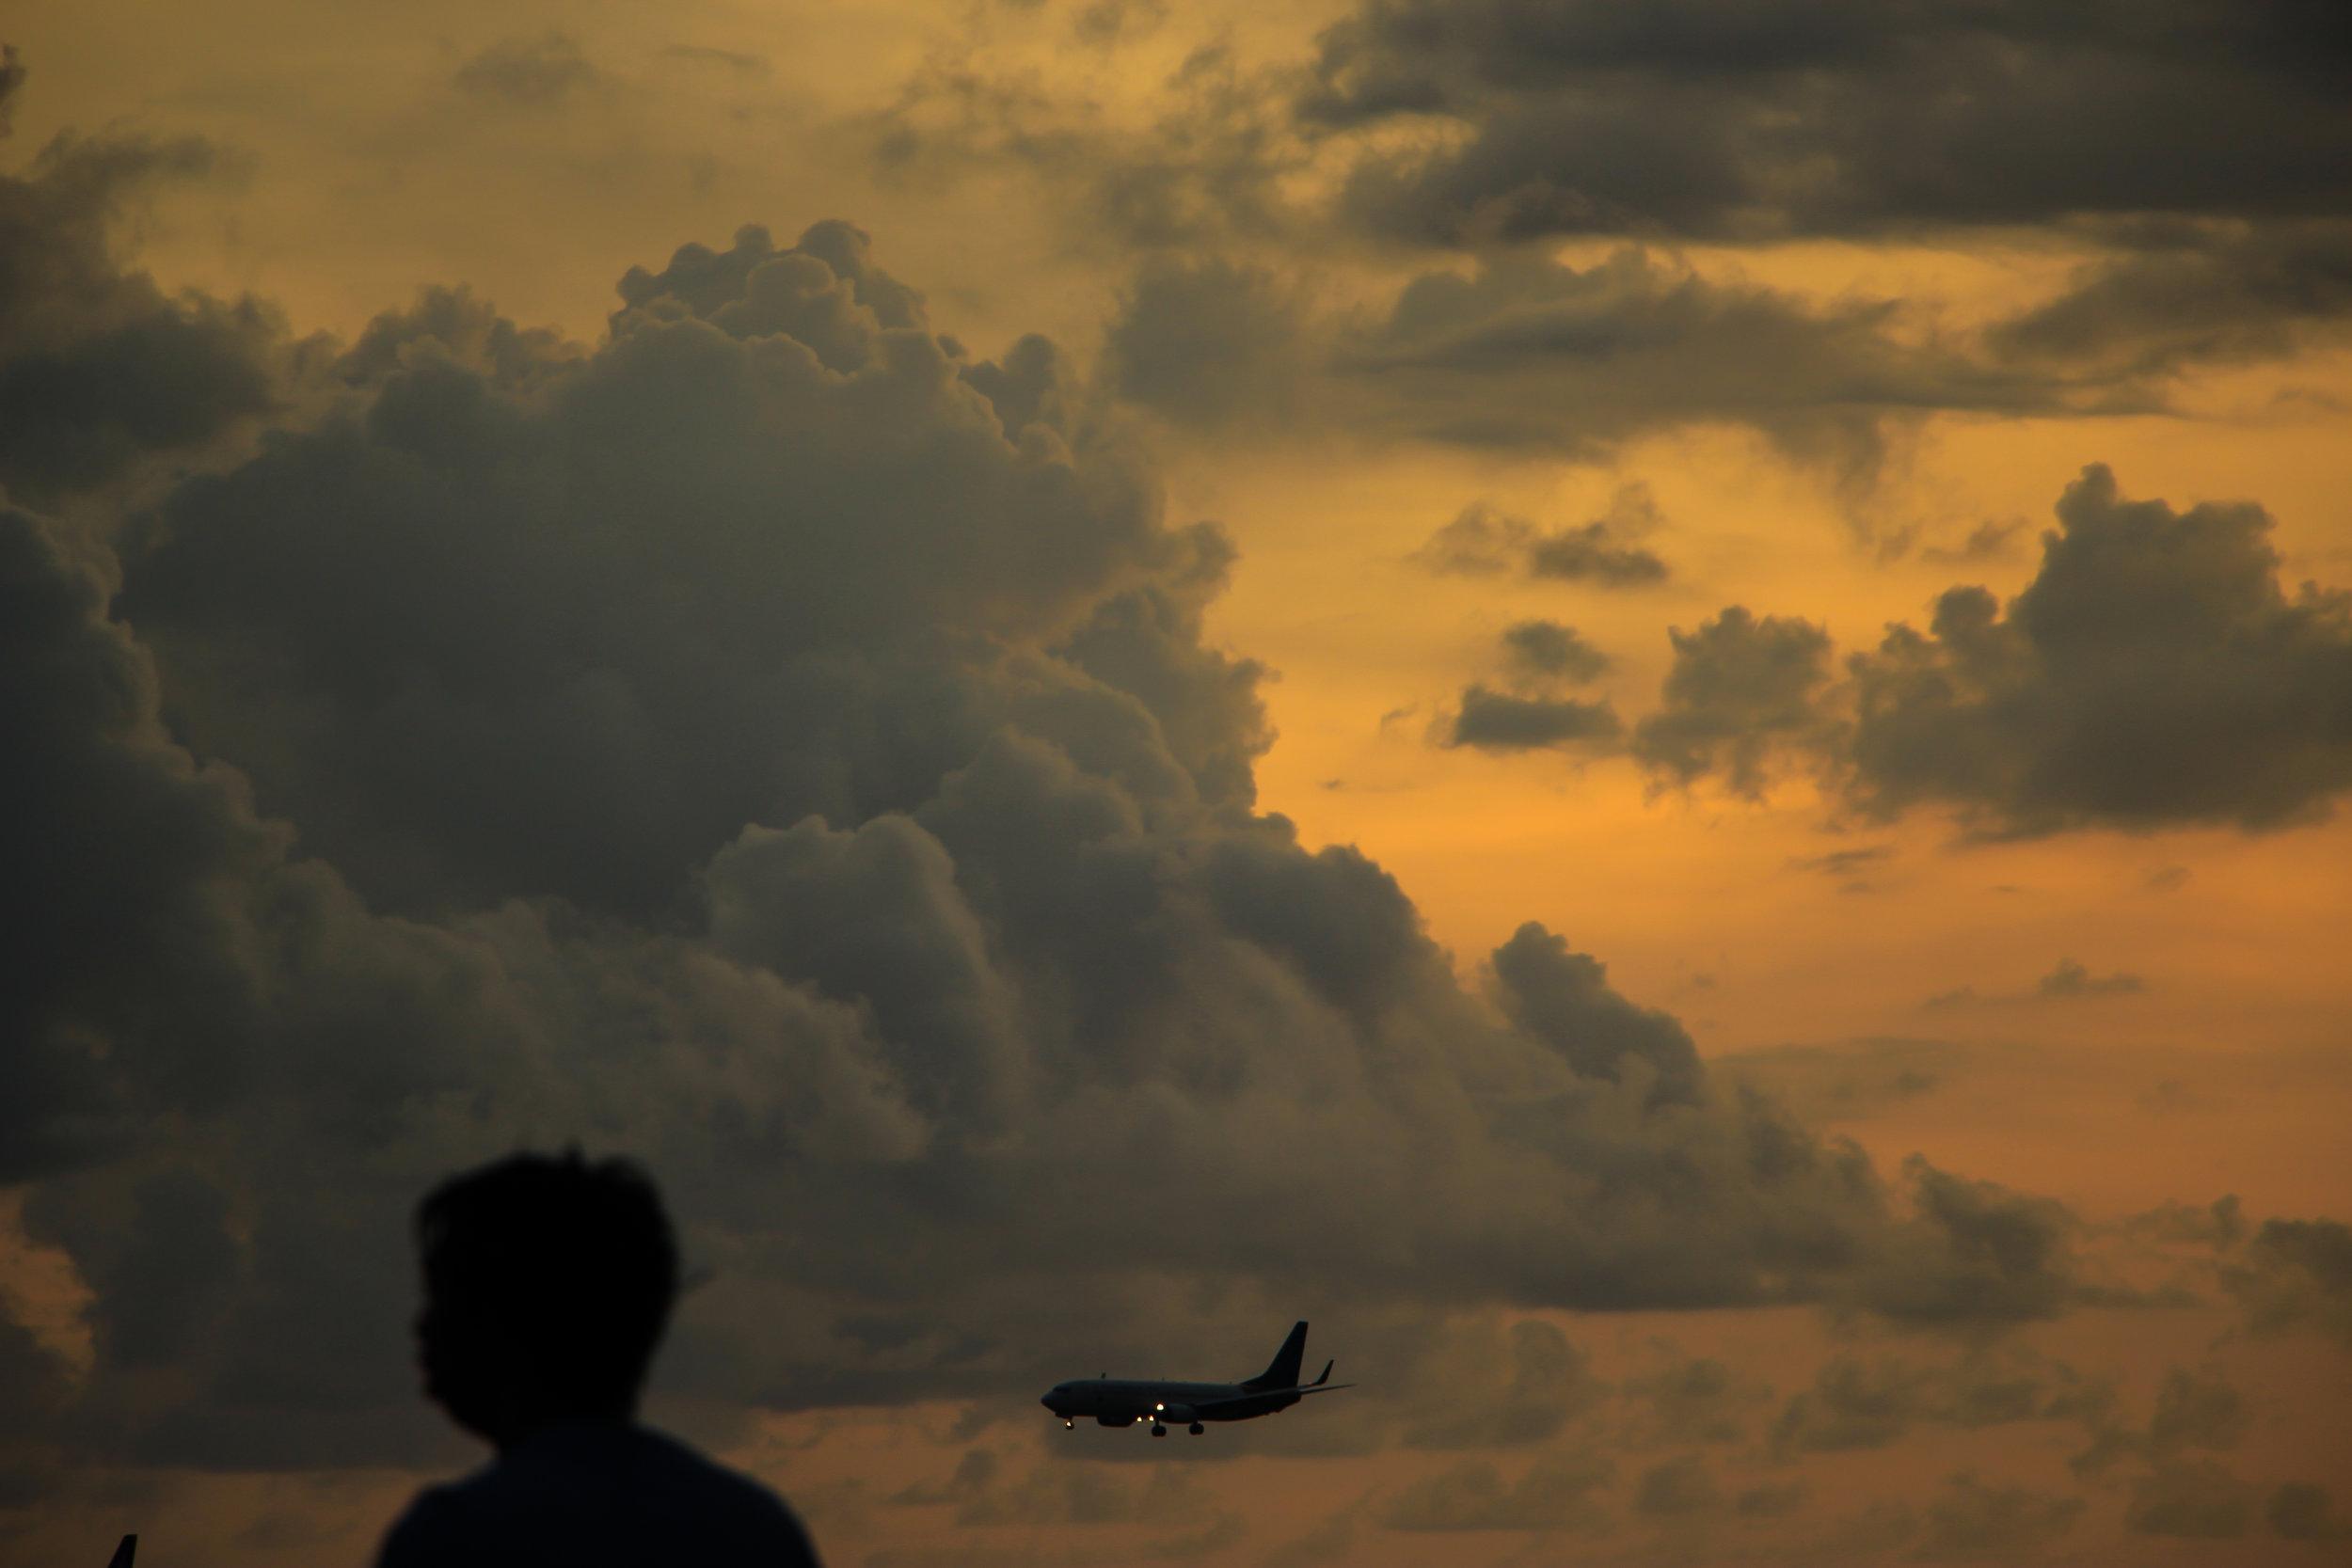 sunset, cloud, airplane, landing, people, Bali, Indonesia, Asia | DoLessGetMoreDone.com |